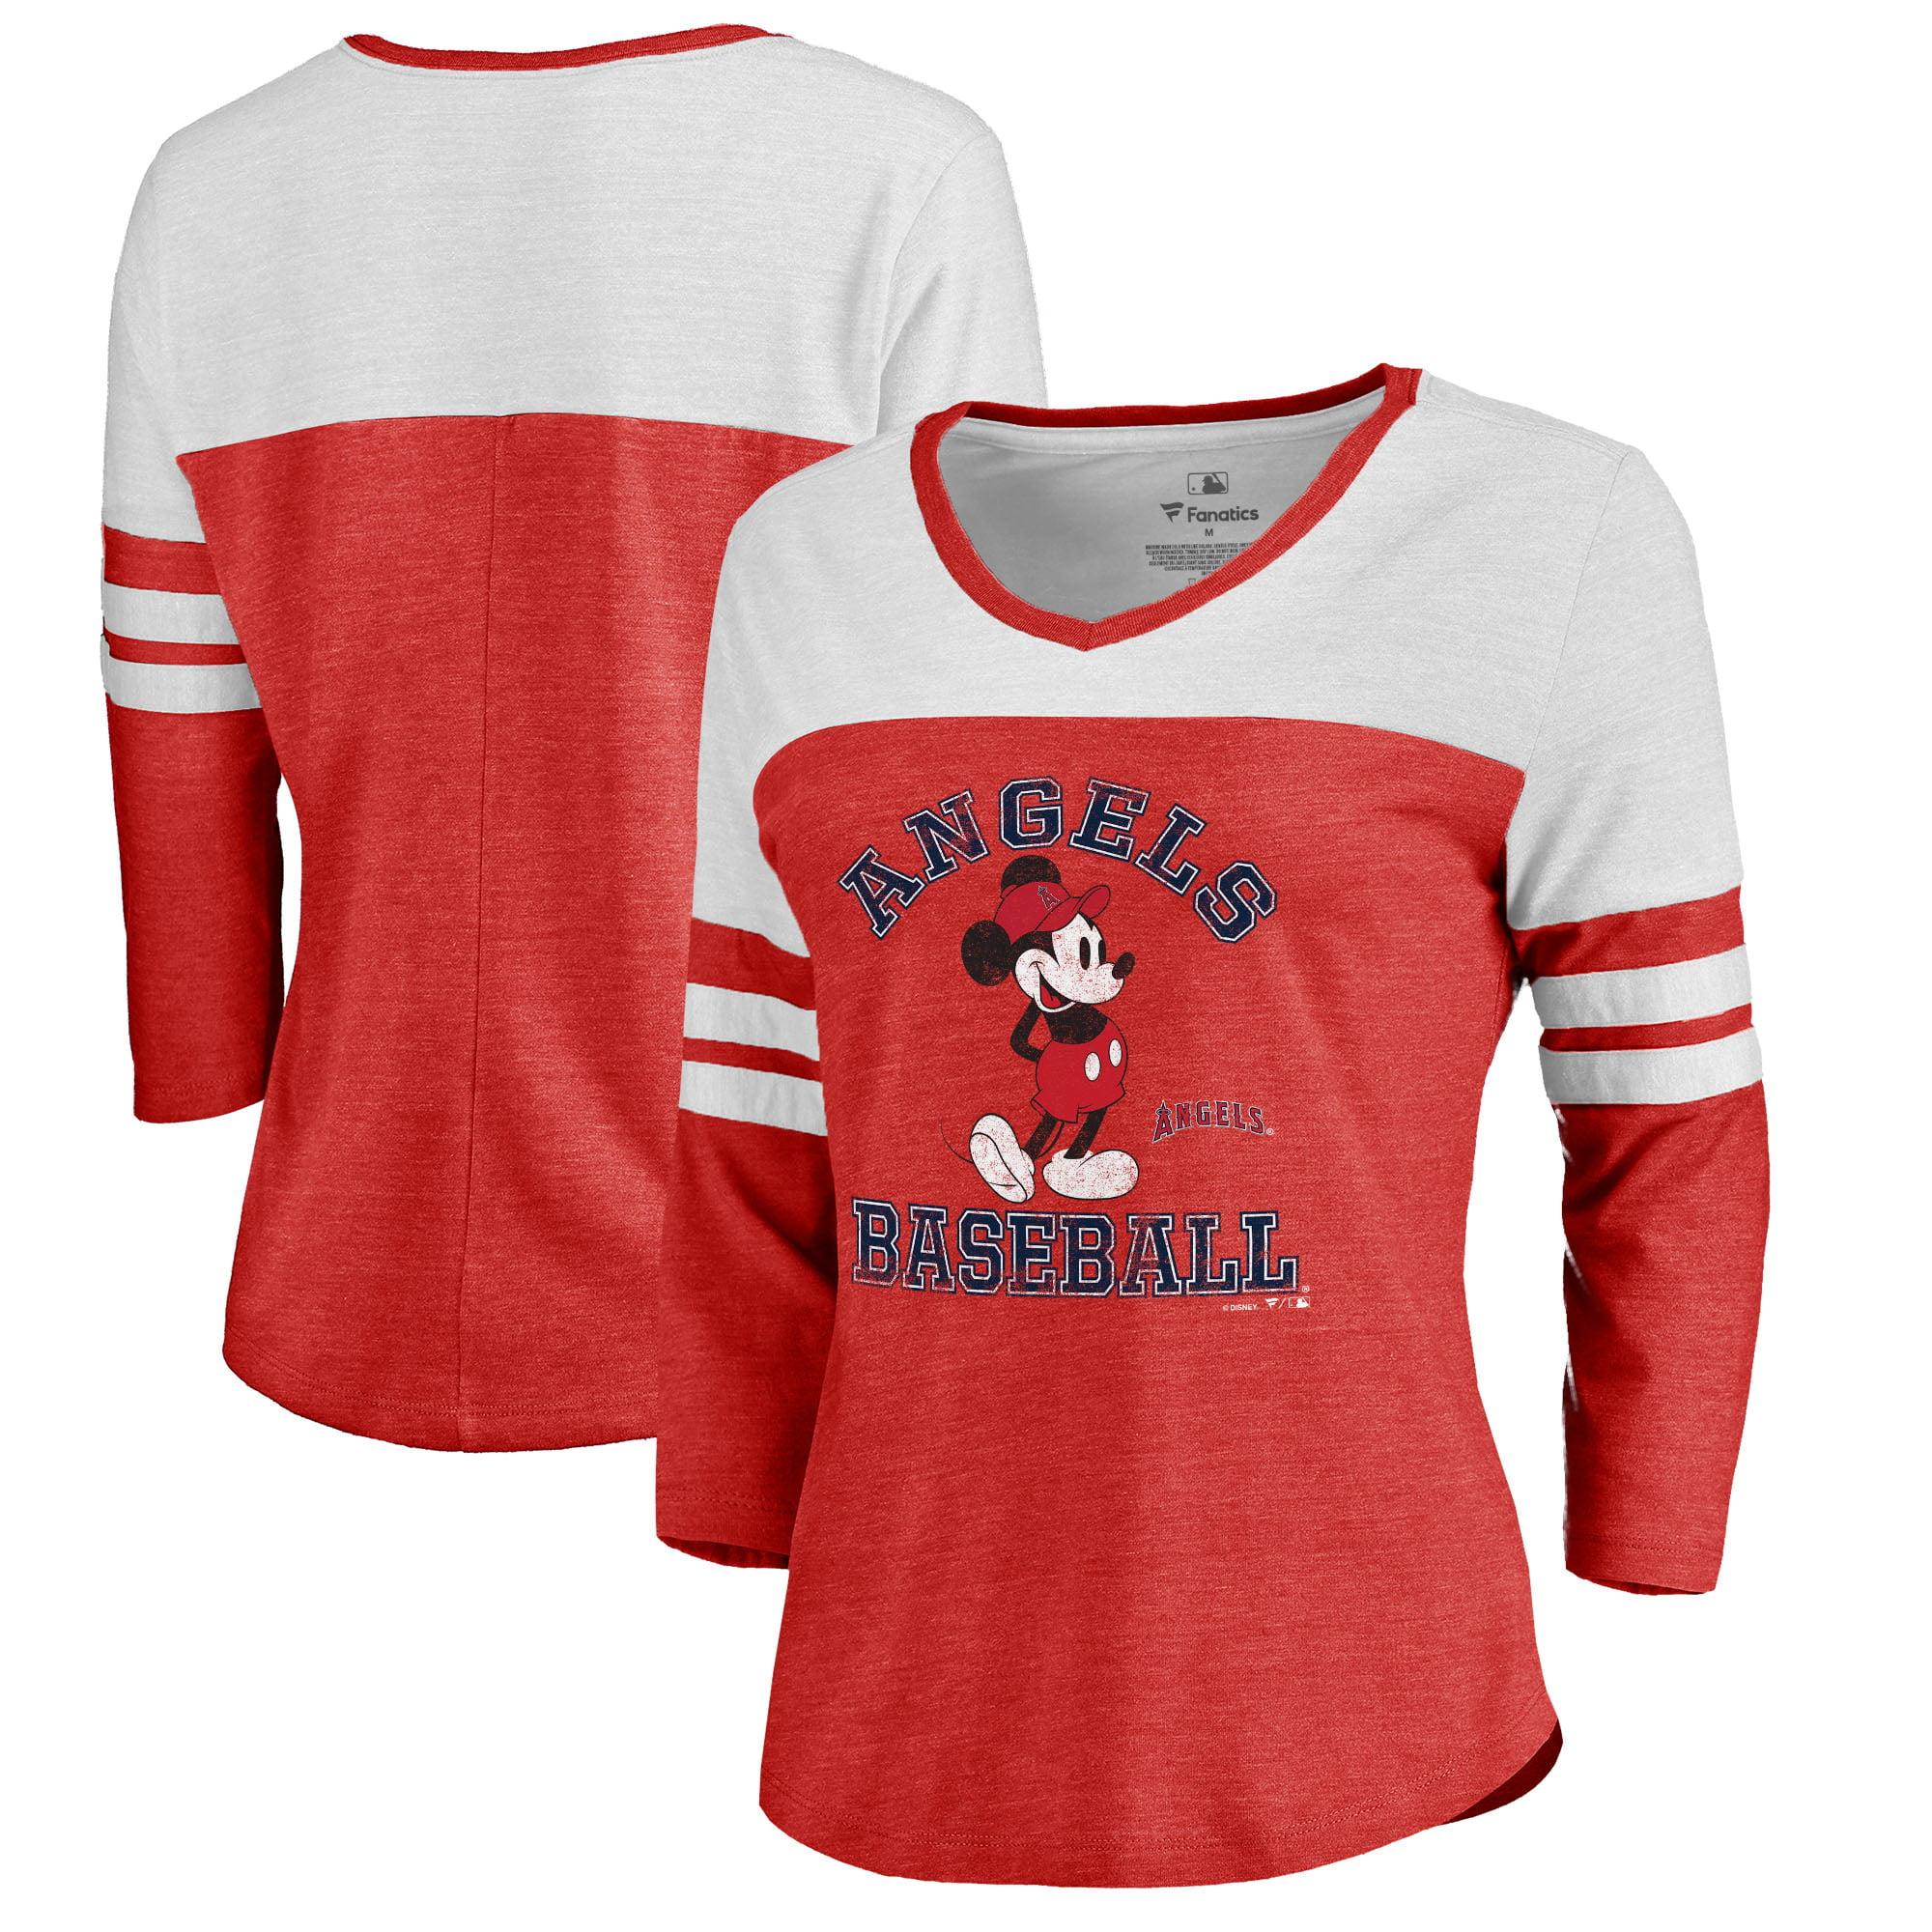 Los Angeles Angels Fanatics Branded Women's Disney MLB Tradition Three-Quarter Sleeve Tri-Blend T-Shirt - Red